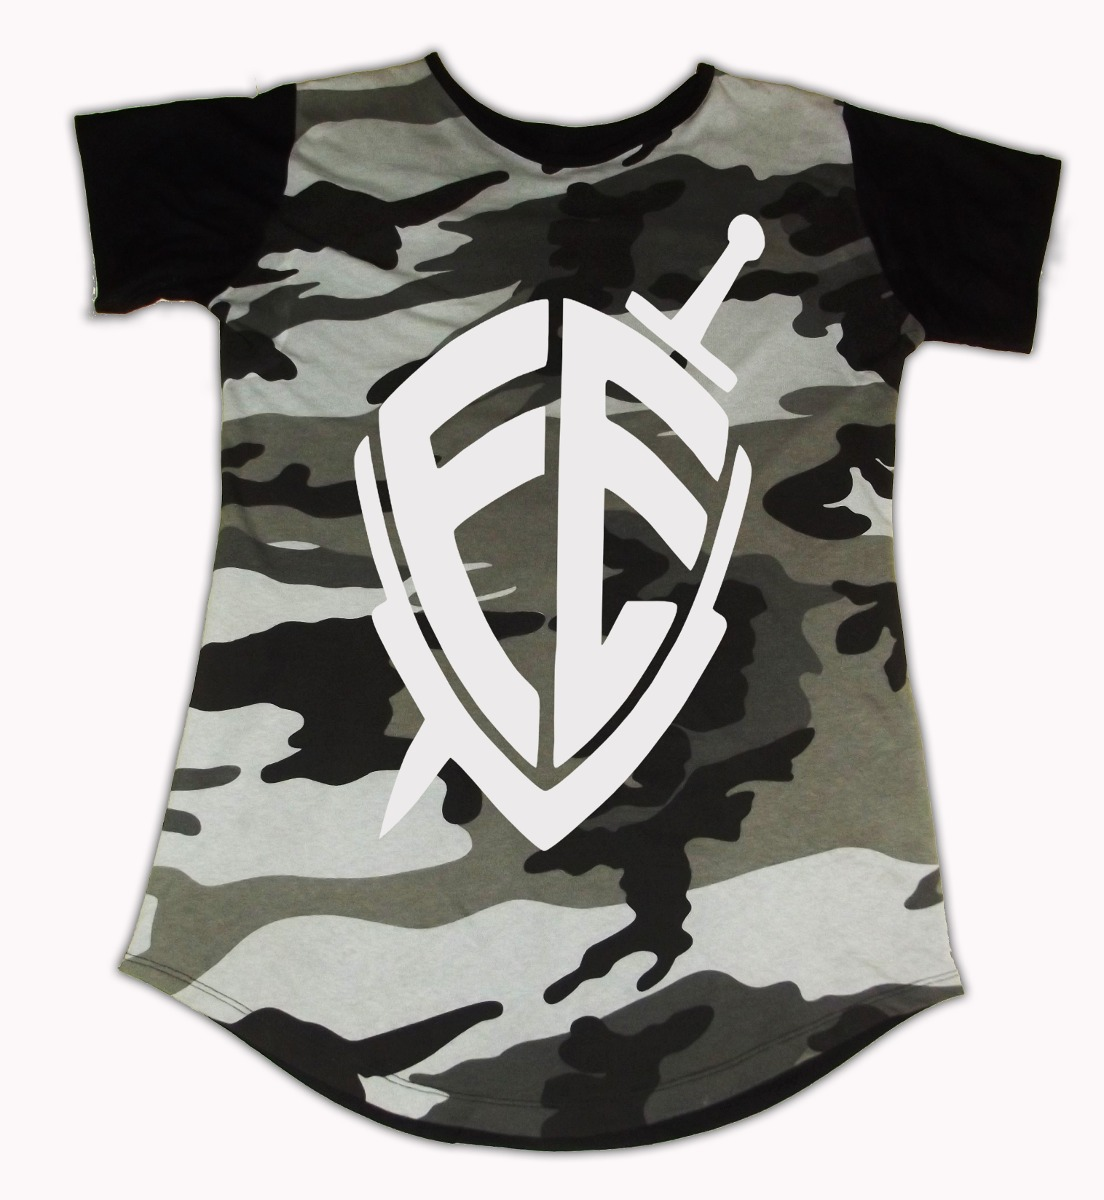 3de990e741 camiseta longline camuflada camisa escrita personalizada. Carregando zoom.